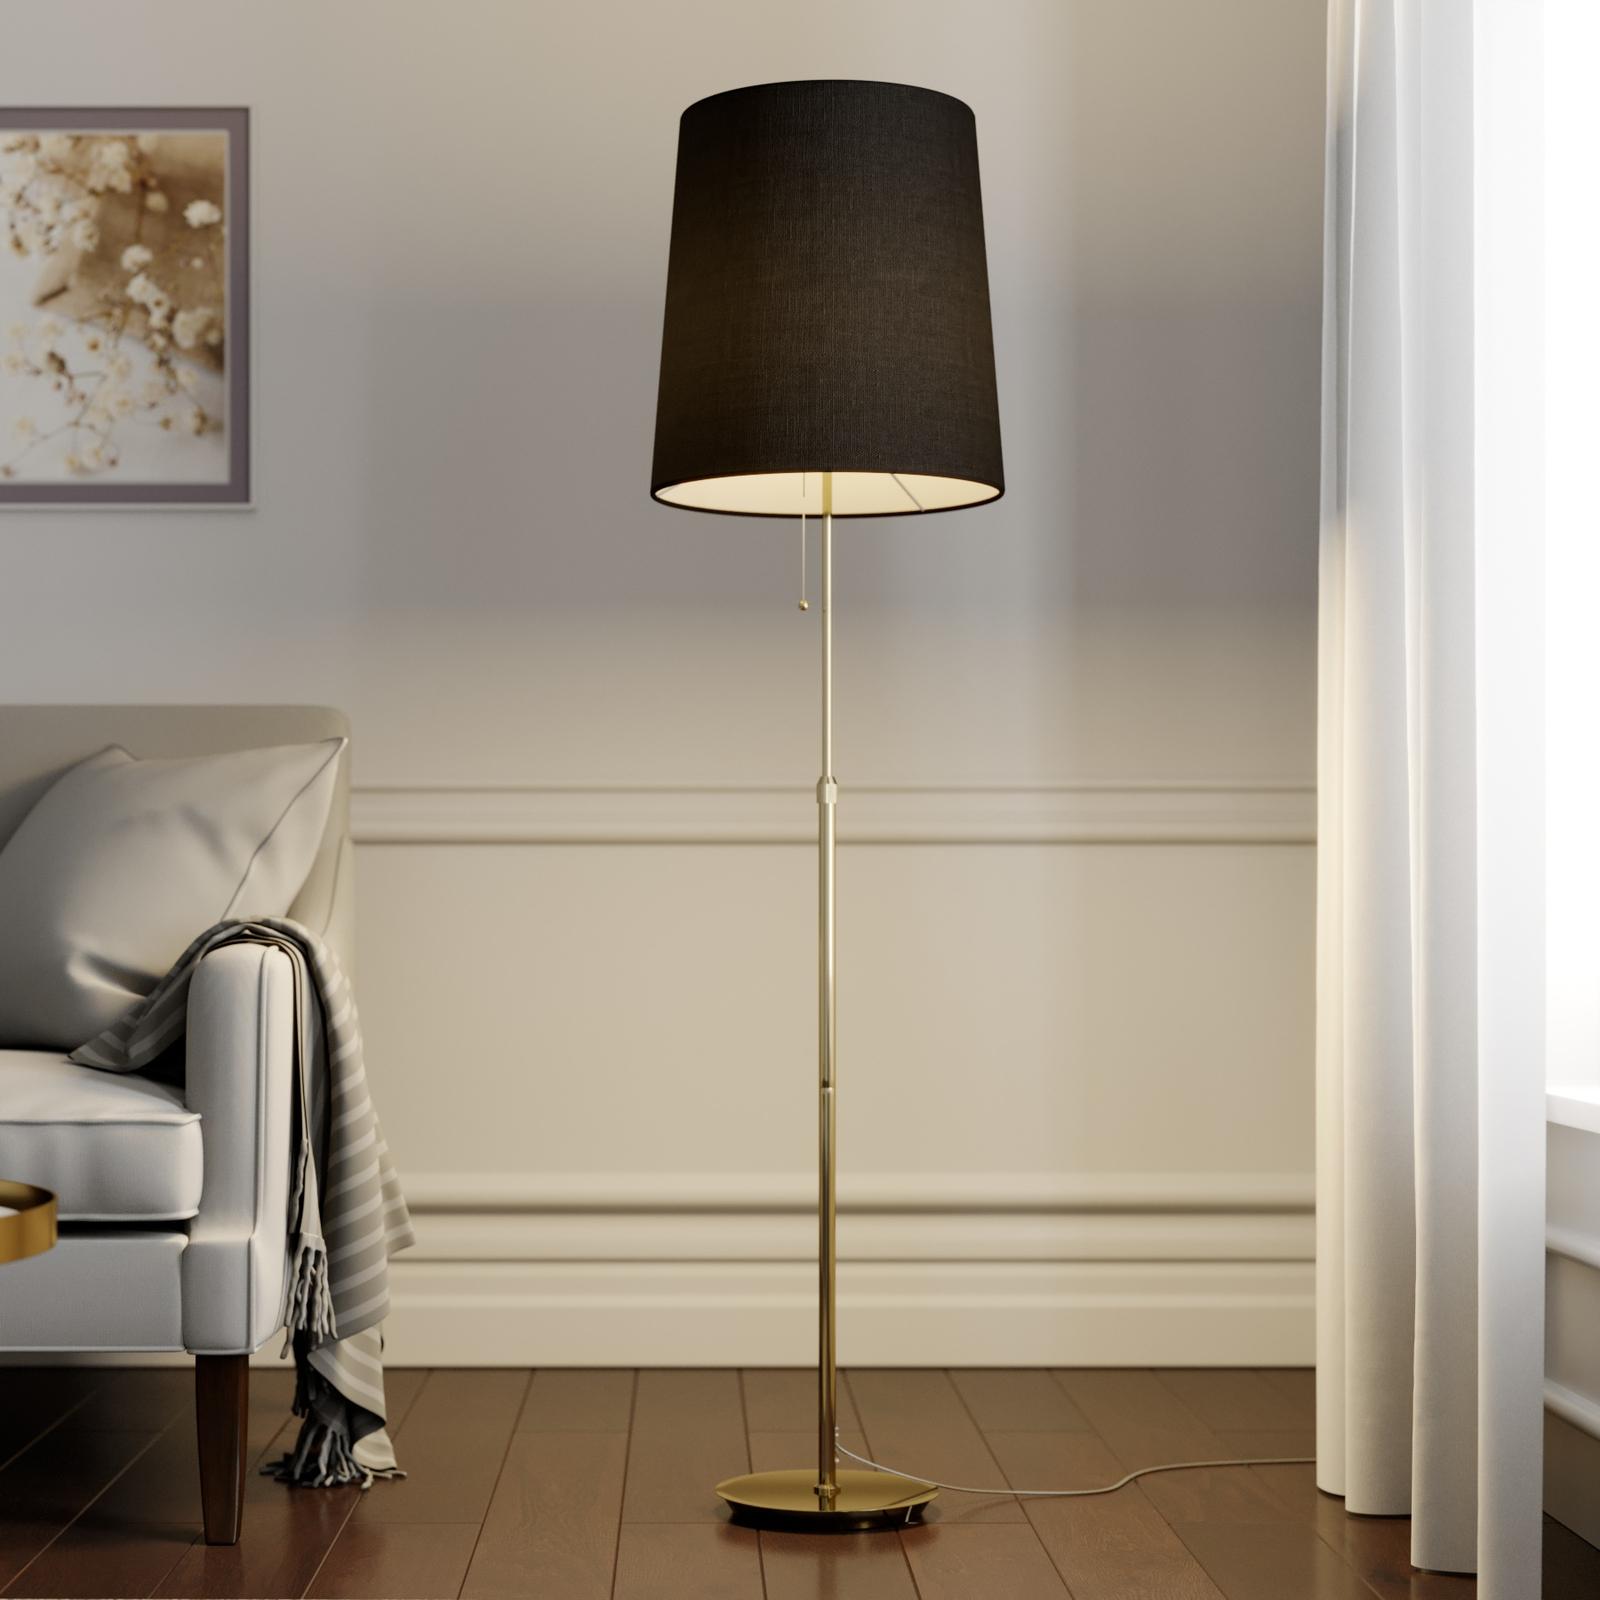 Lucande Pordis vloerlamp, 155 cm, messing-goud